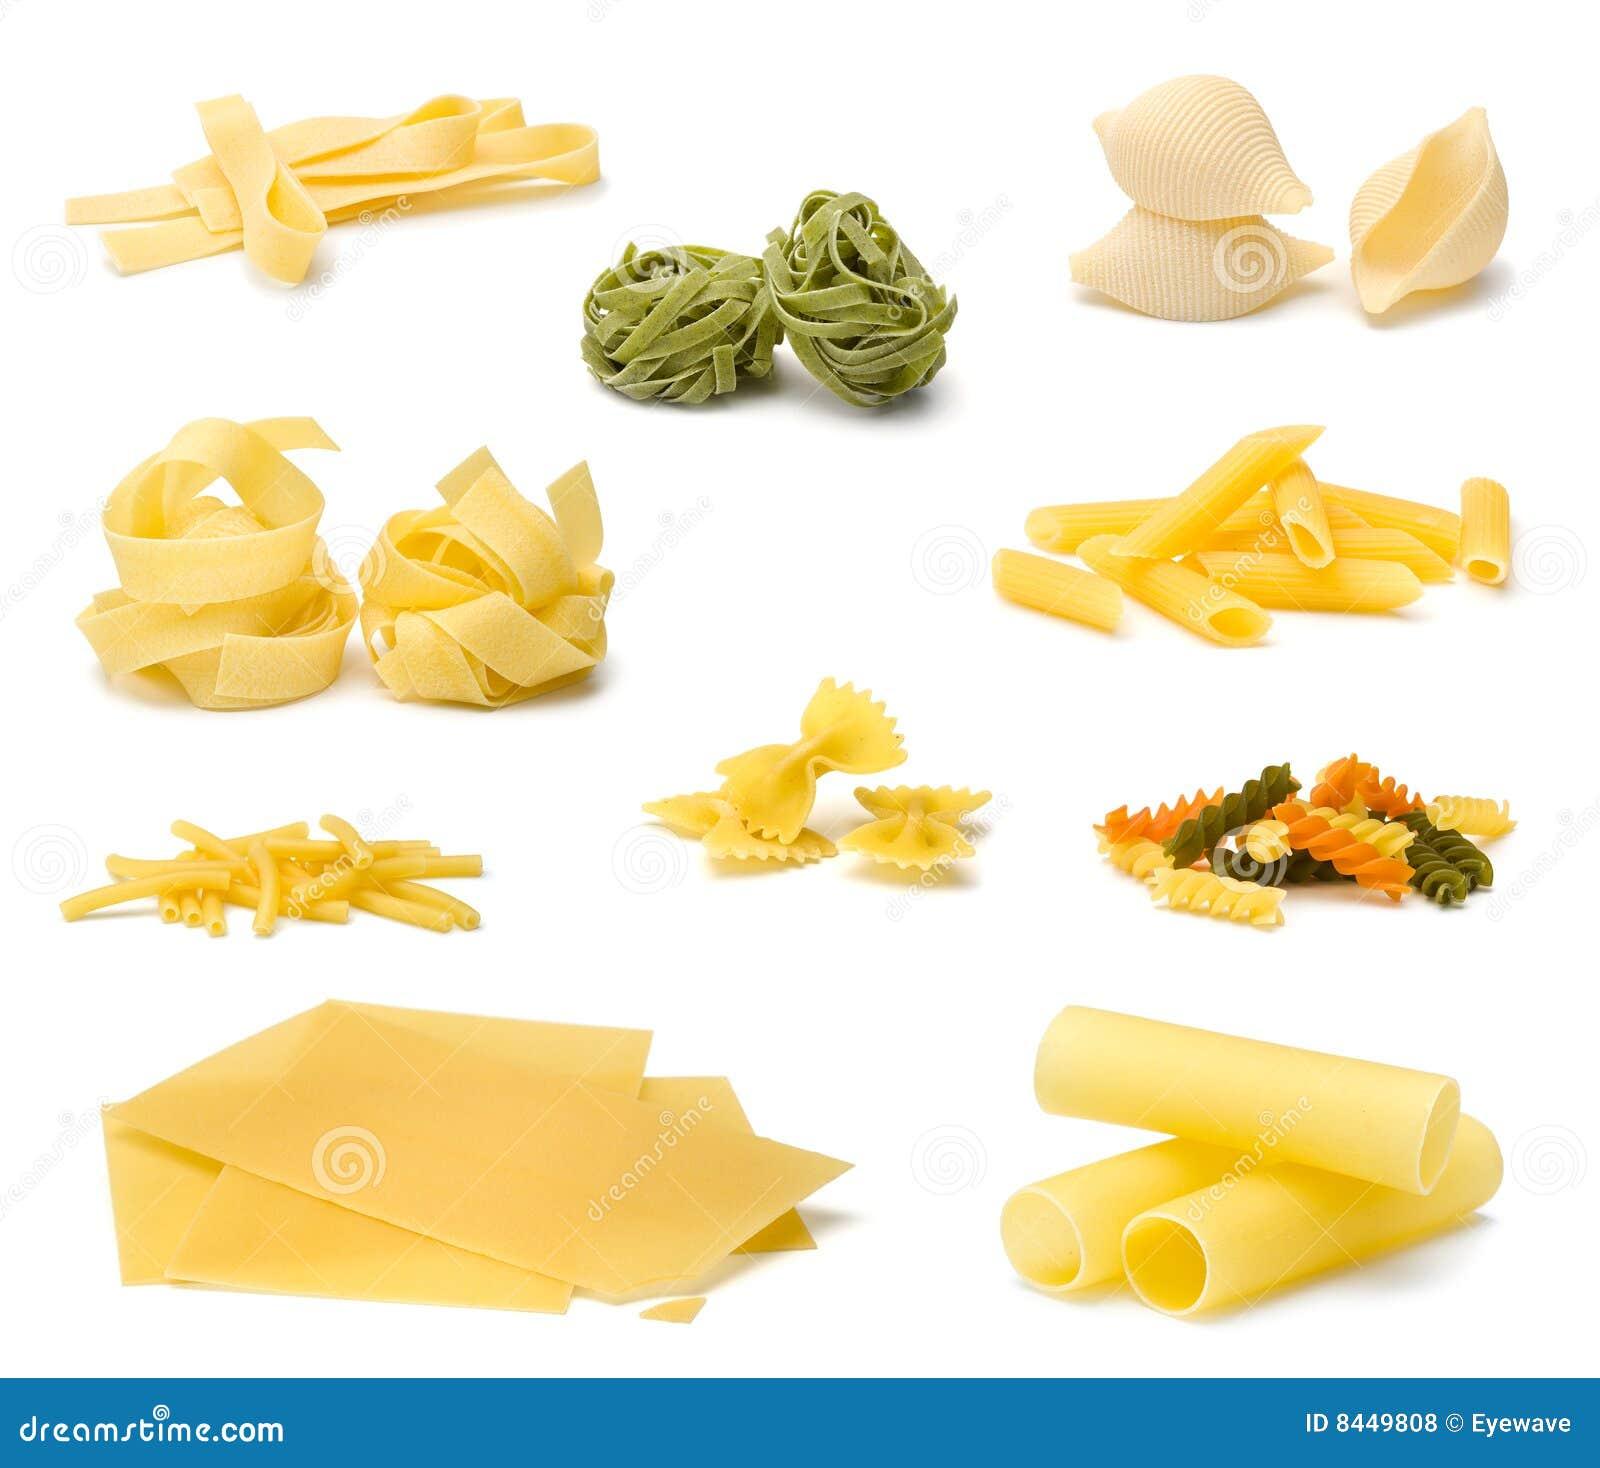 Pasta specialties